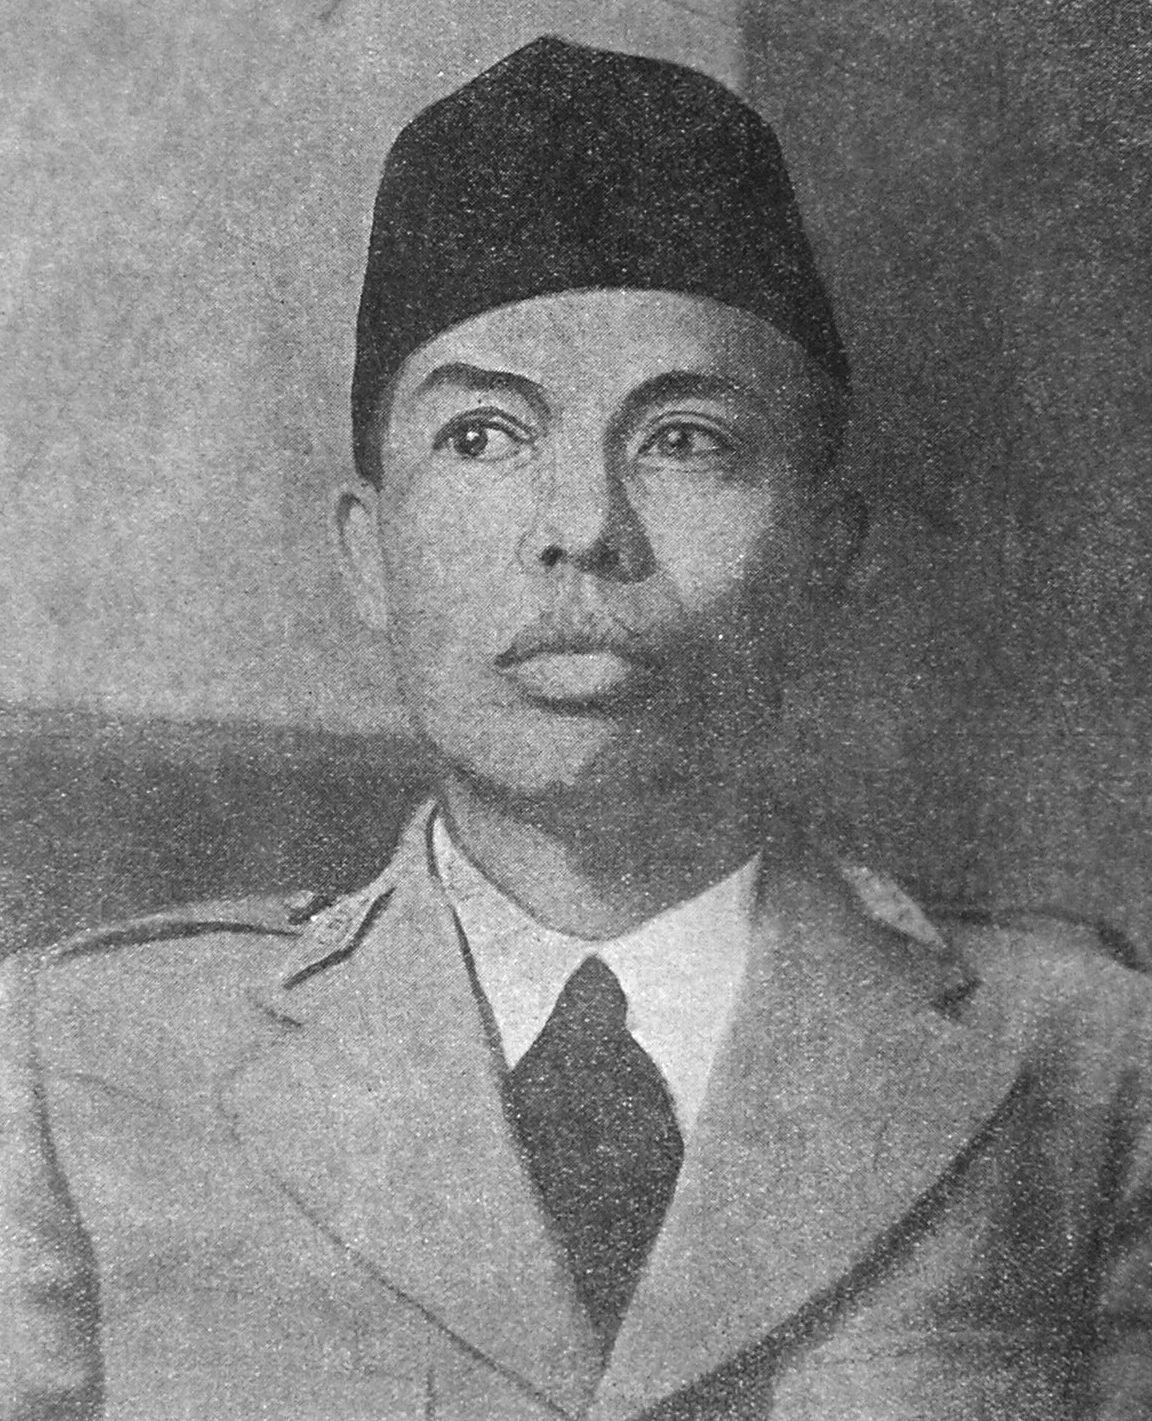 Gambar Pahlawan Indonesia Hitam Putih